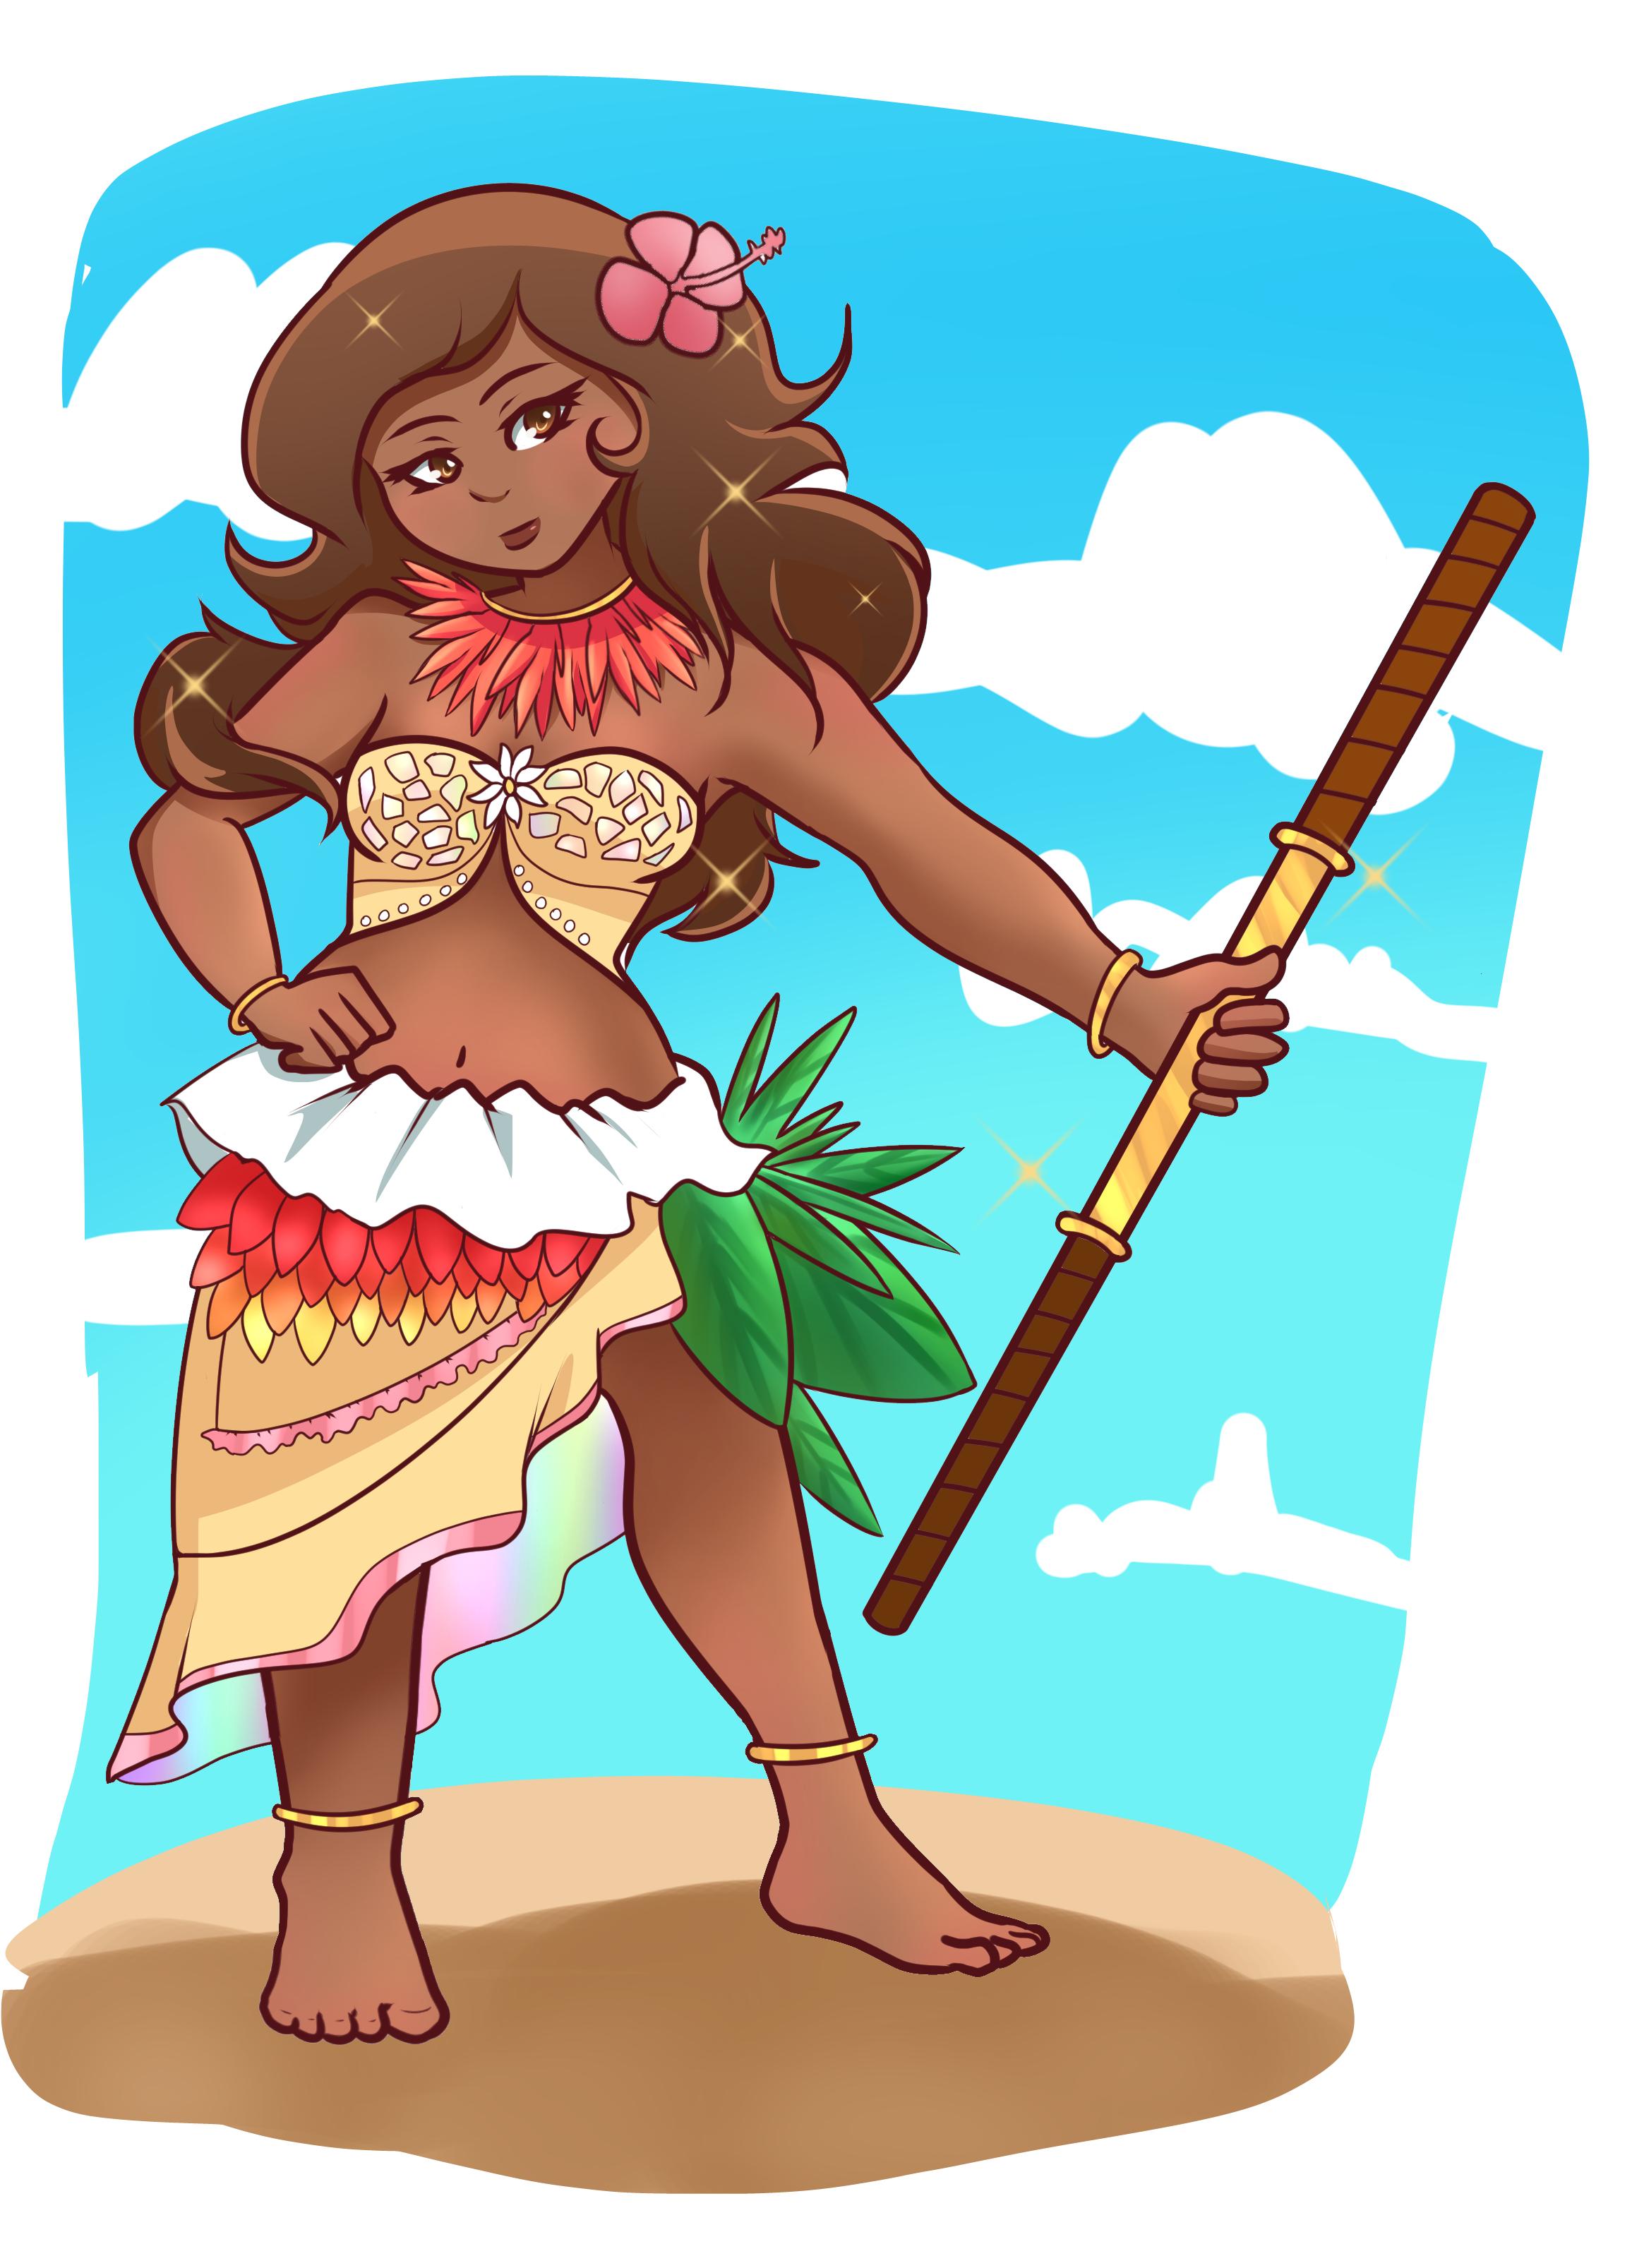 Magical Island Girl by Sukaaretto on Newgrounds.